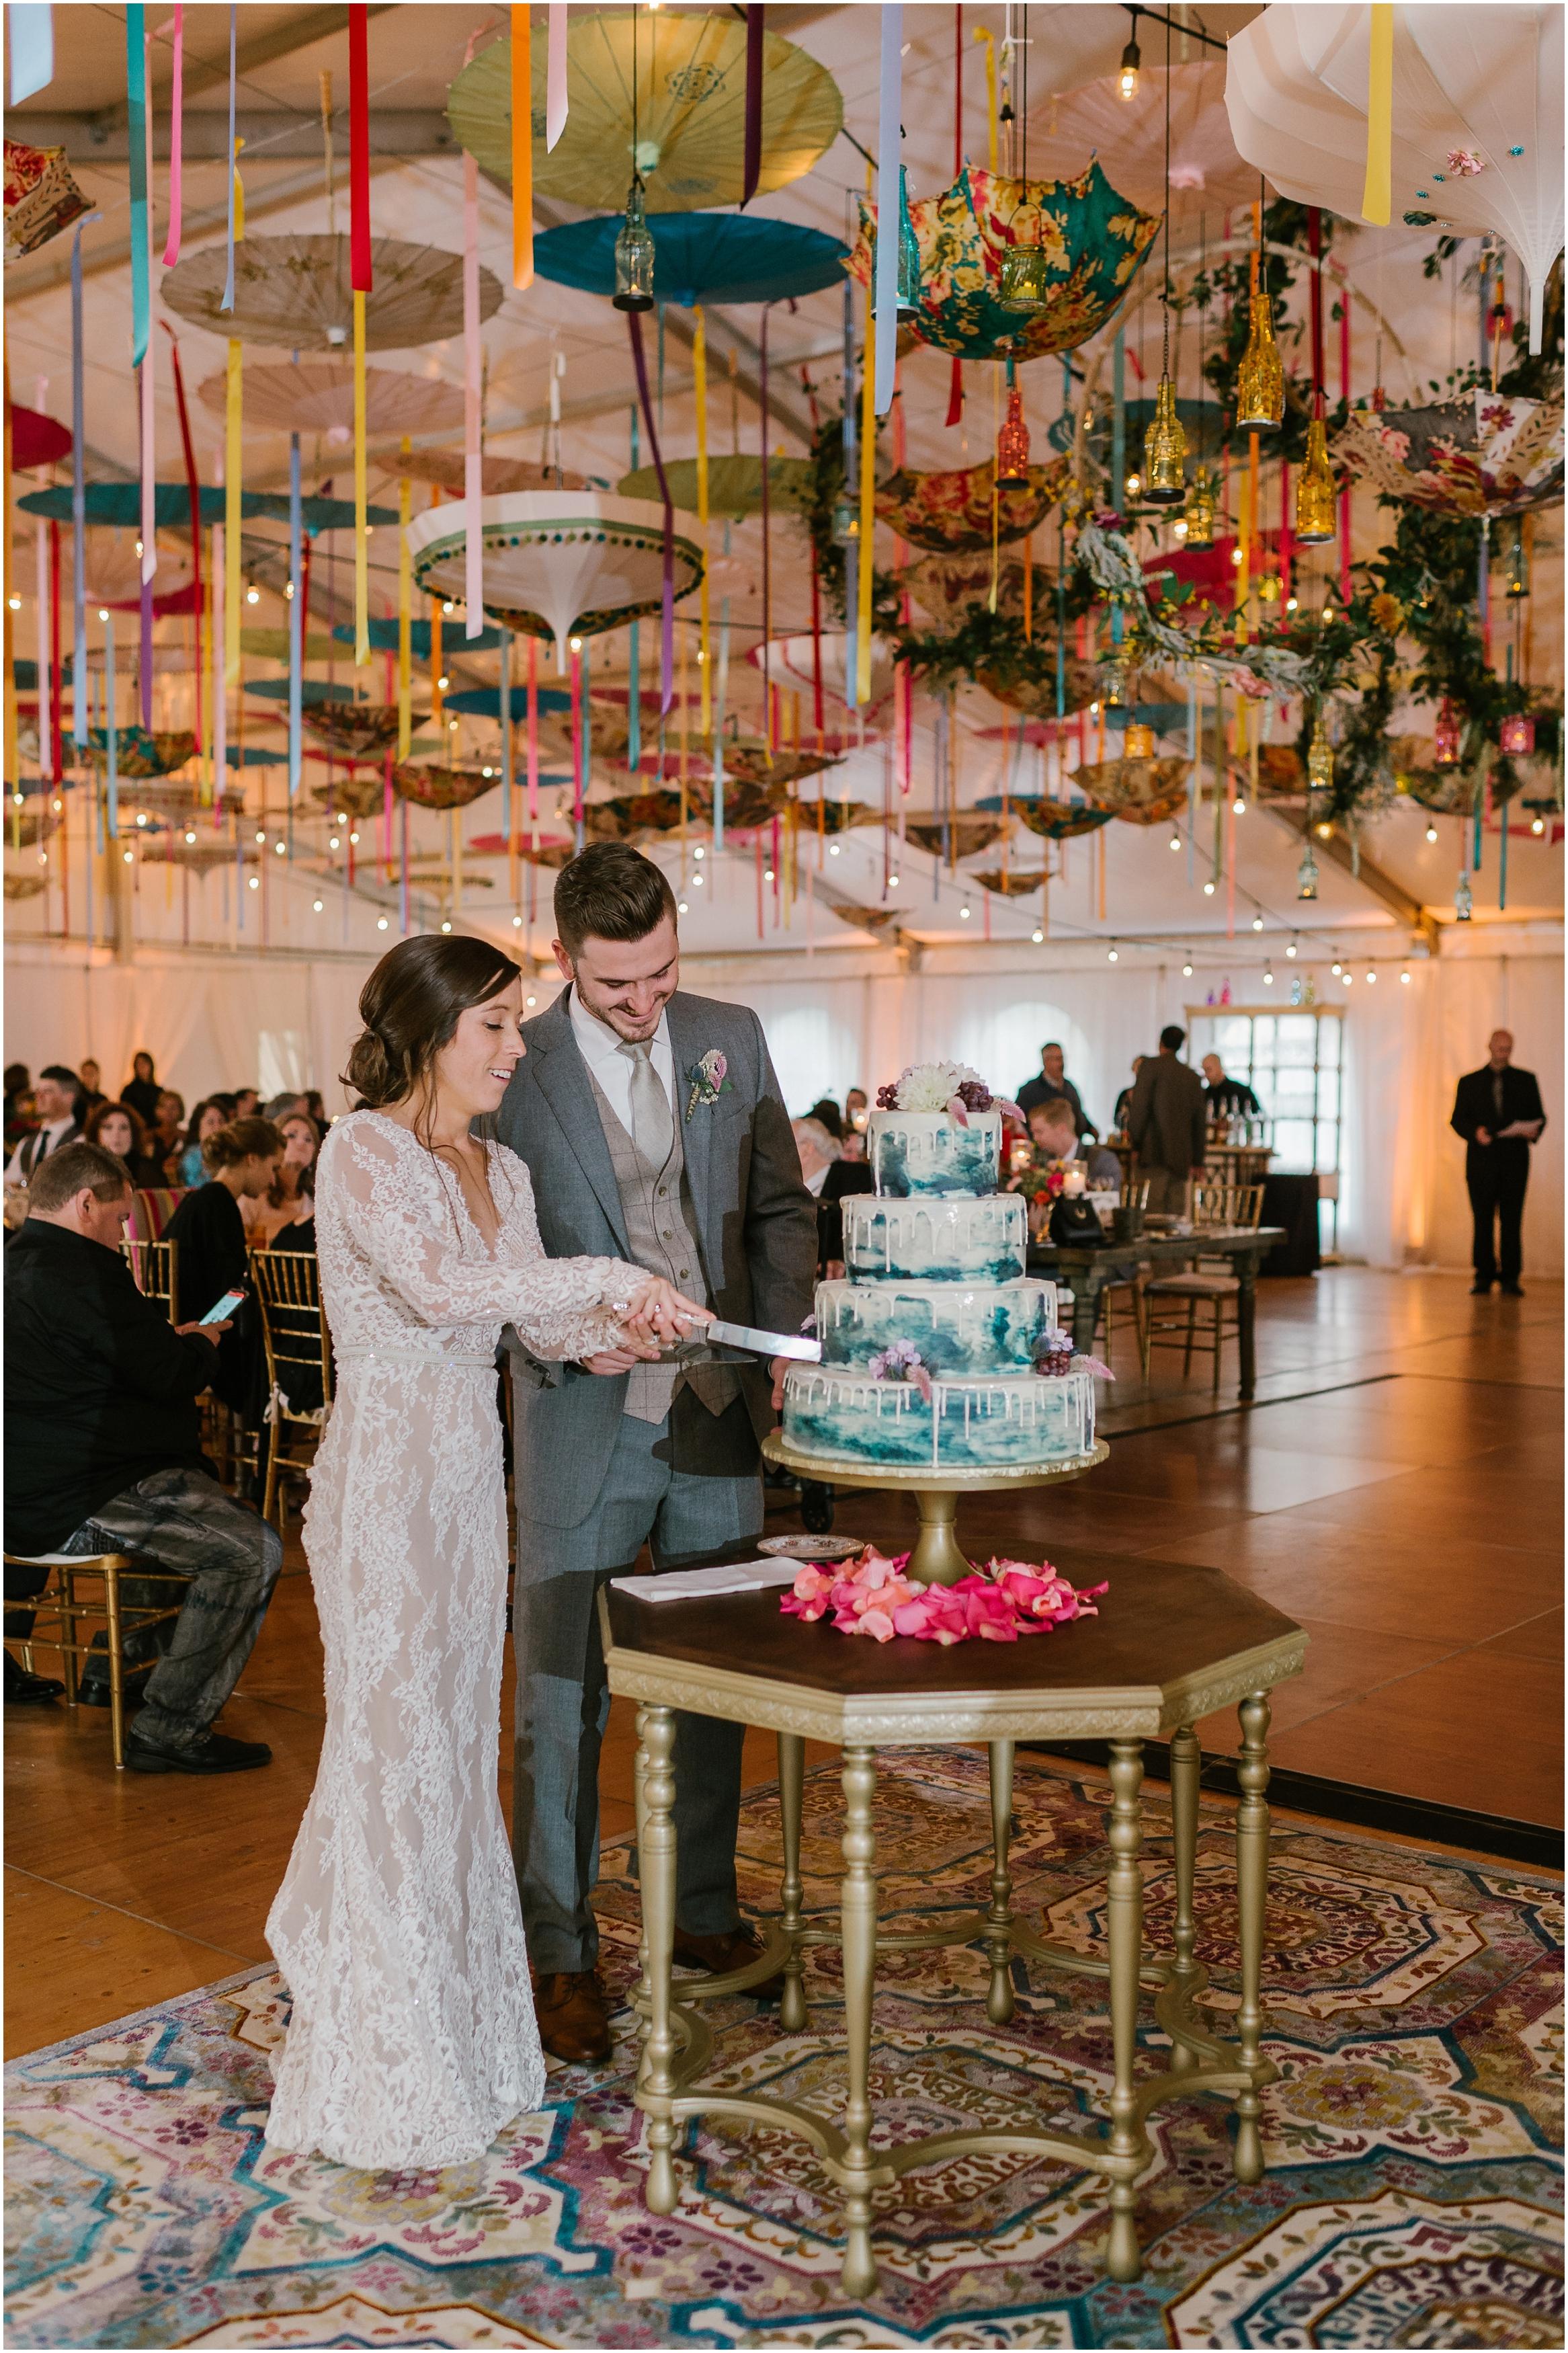 Rebecca_Shehorn_Photography_Indianapolis_Wedding_Photographer_9288.jpg